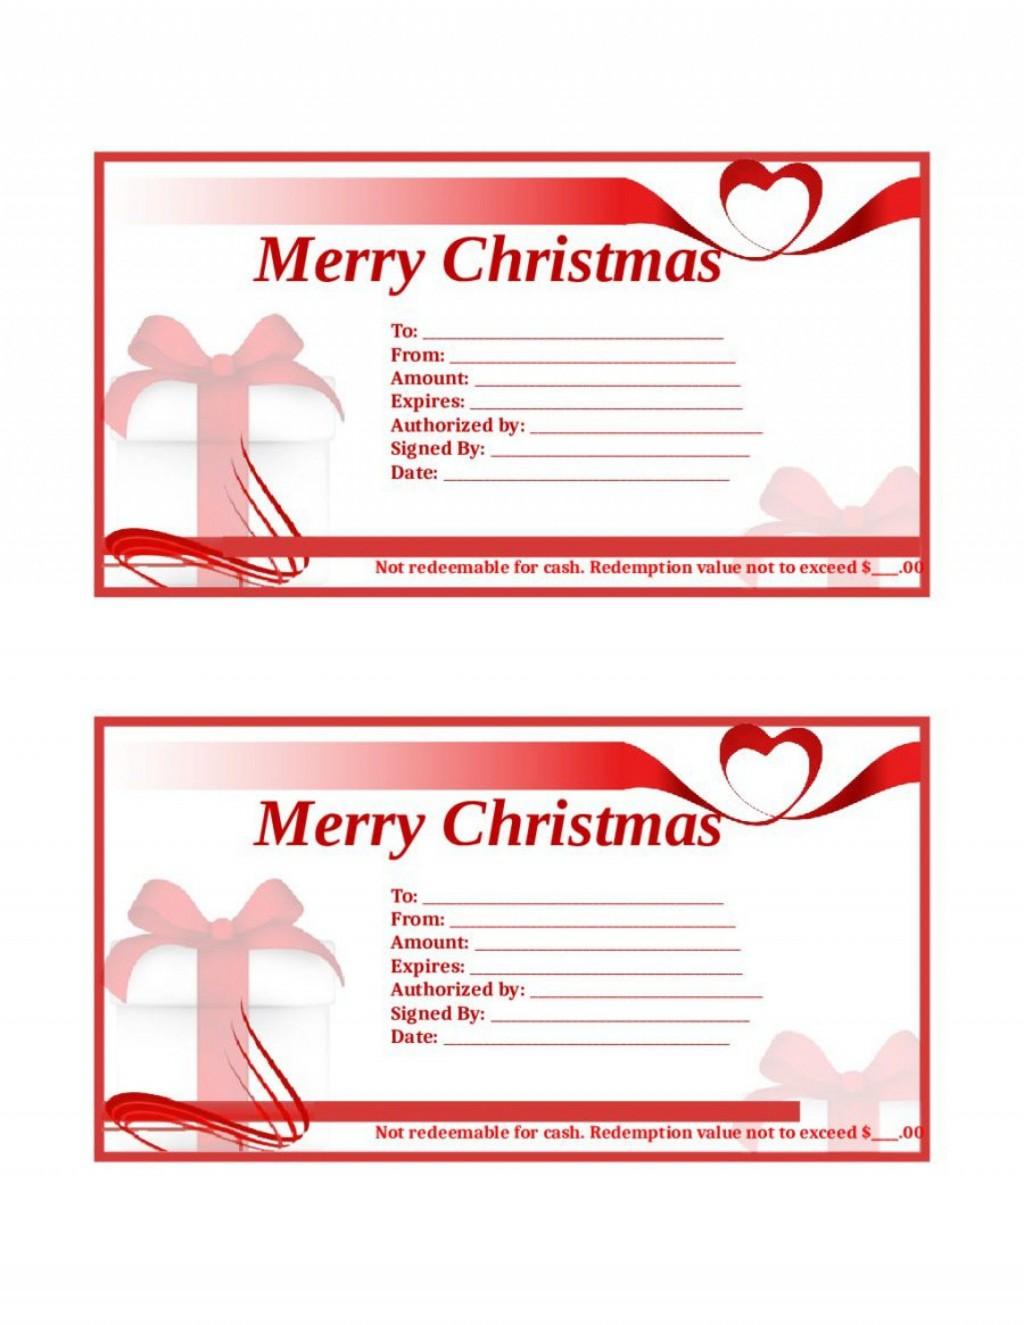 002 Surprising Template For Christma Gift Certificate Free Sample  Voucher Uk Editable Download Microsoft WordLarge